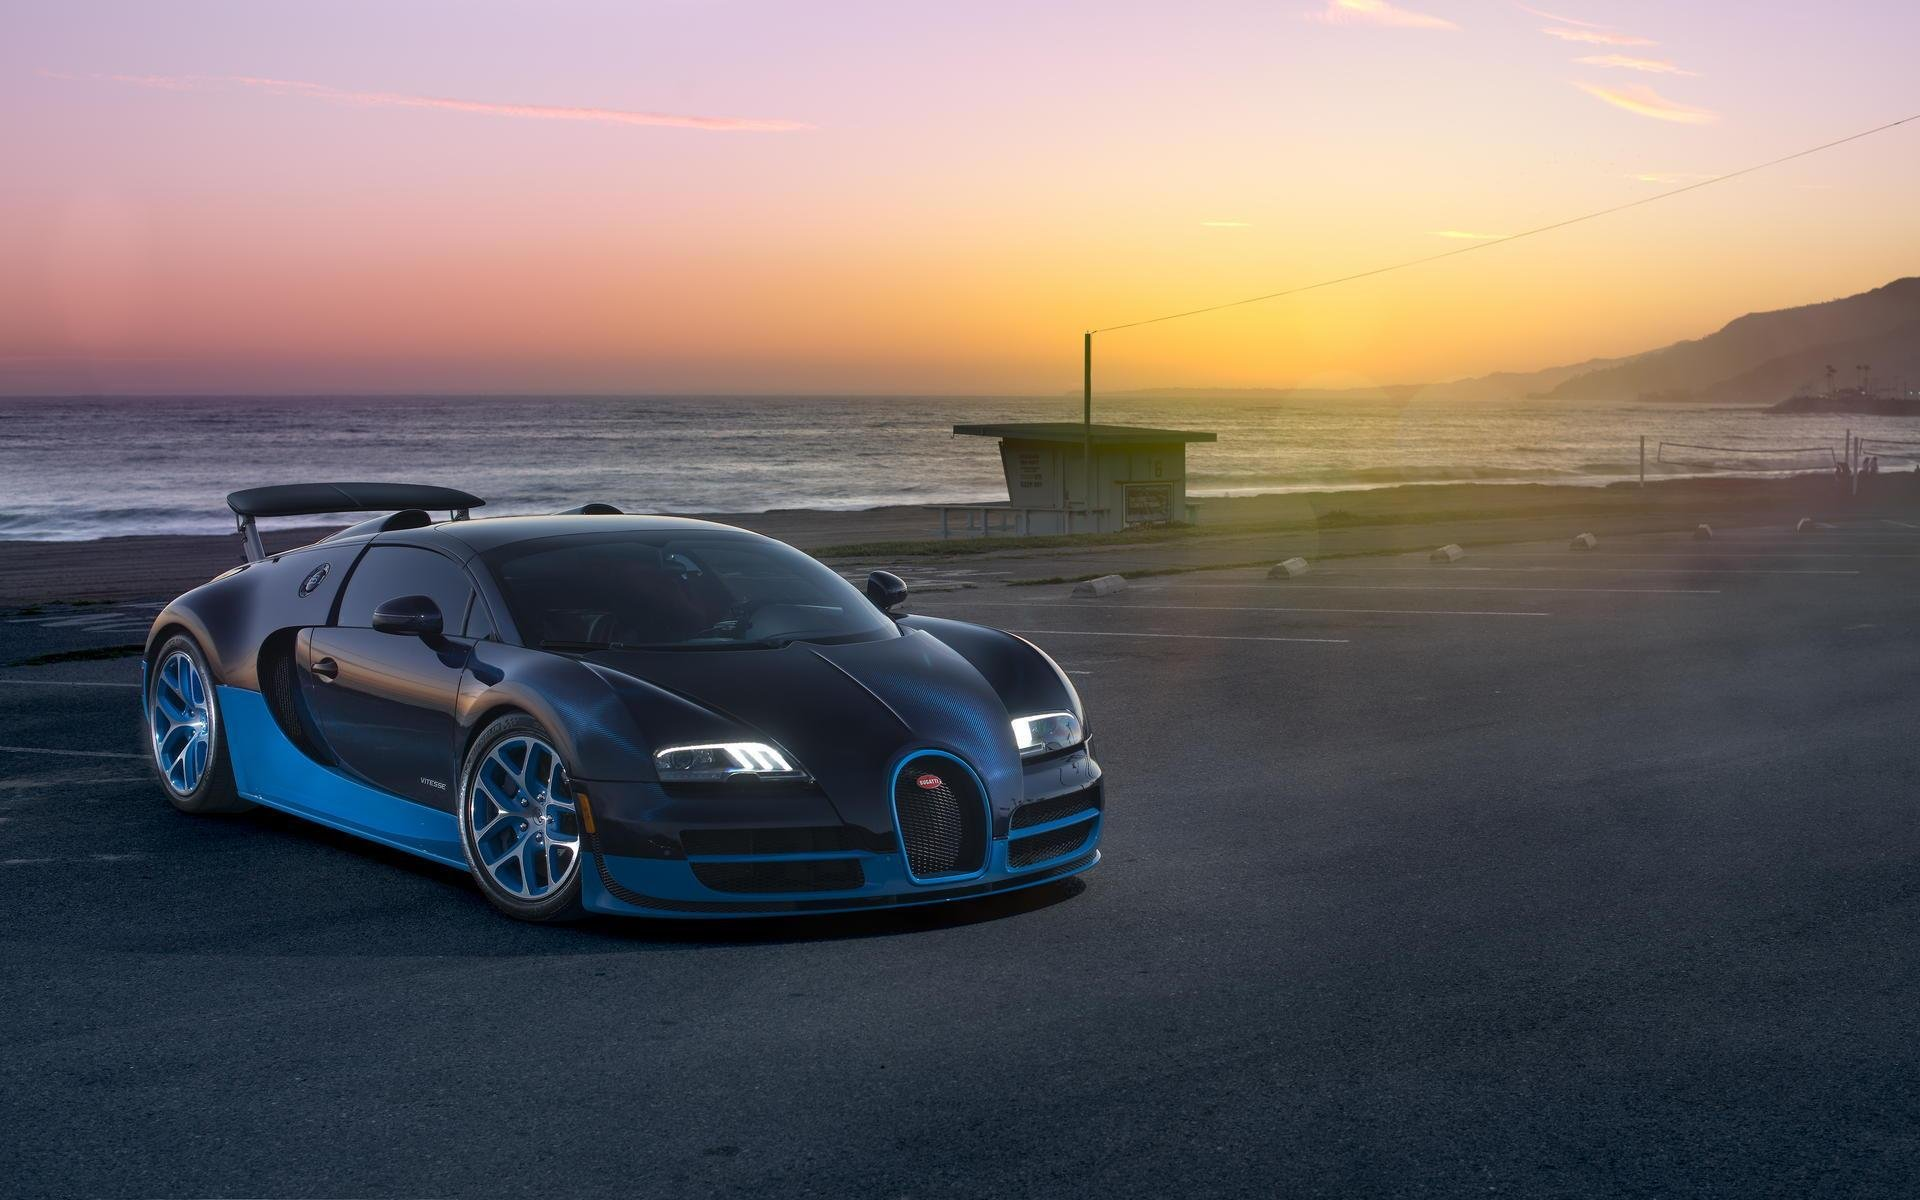 Bugatti Veyron Grand Sport Vitesse Supercar Supercar Sea